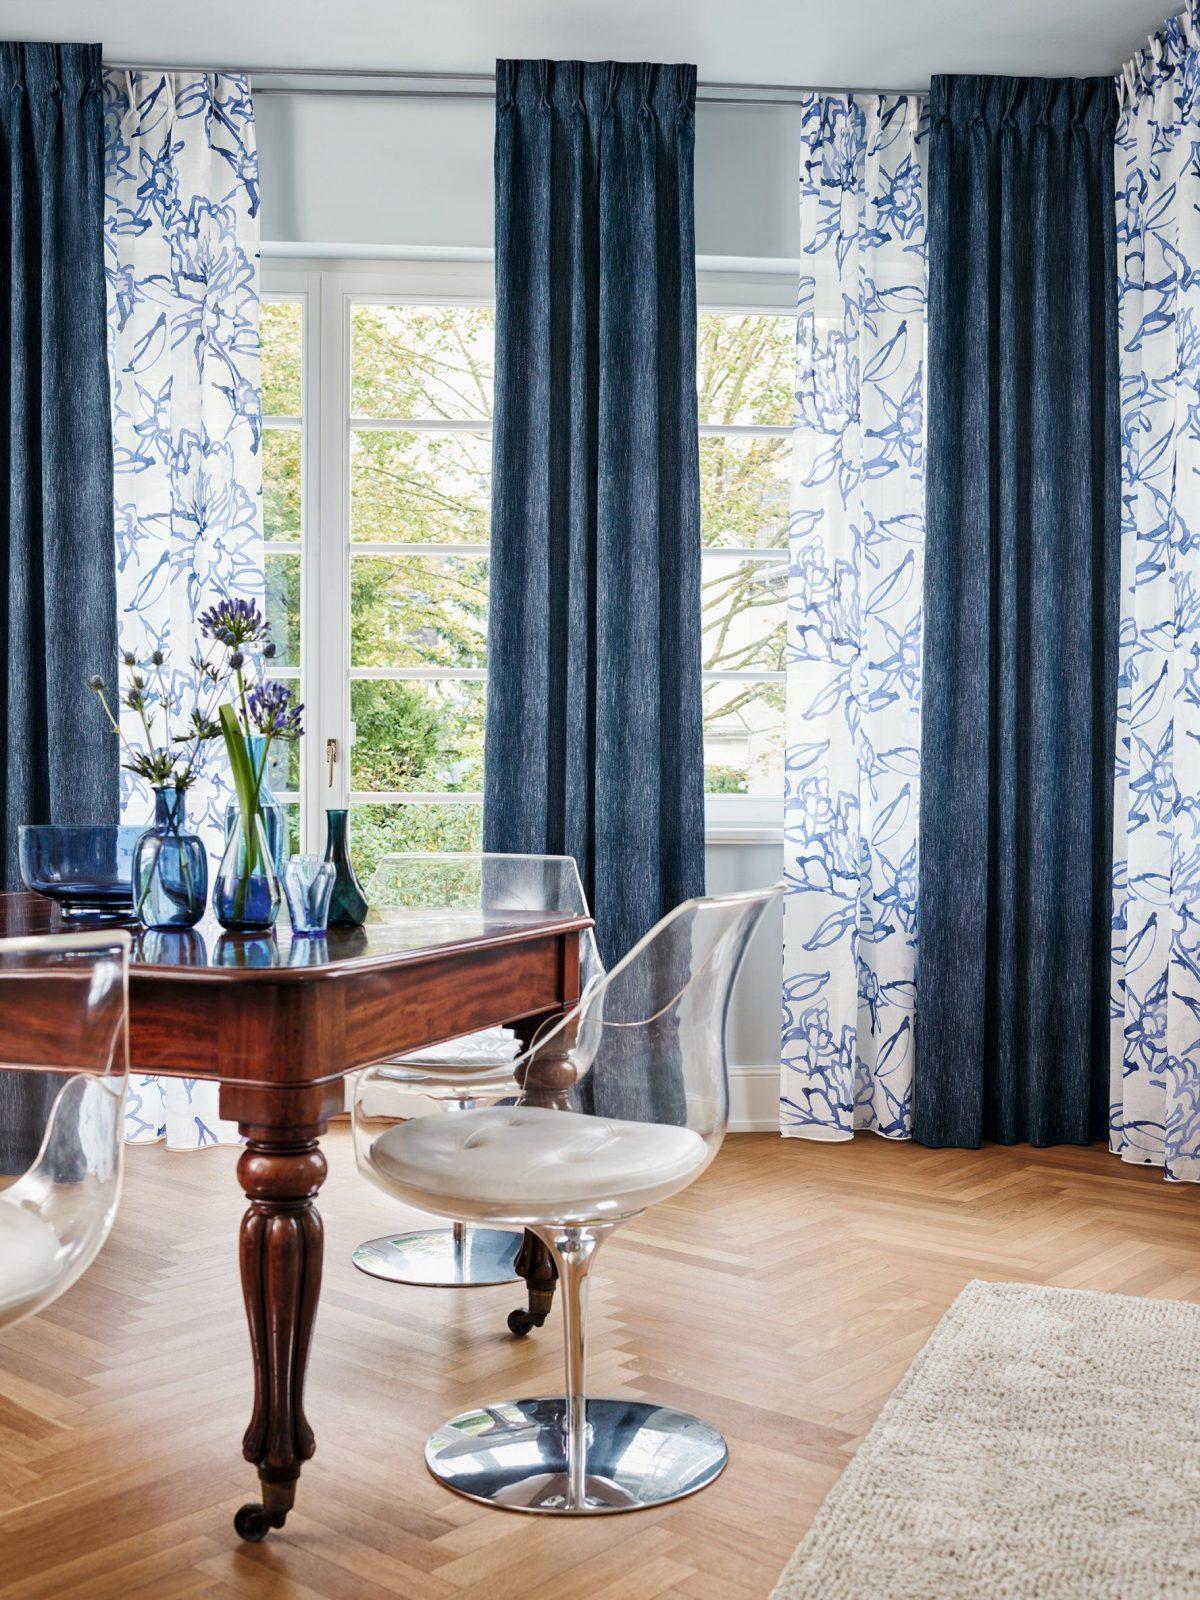 Ehrfürchtig Ado Gardinen Kollektion 2017 Design von Ado Gardinen Neue Kollektion Bild